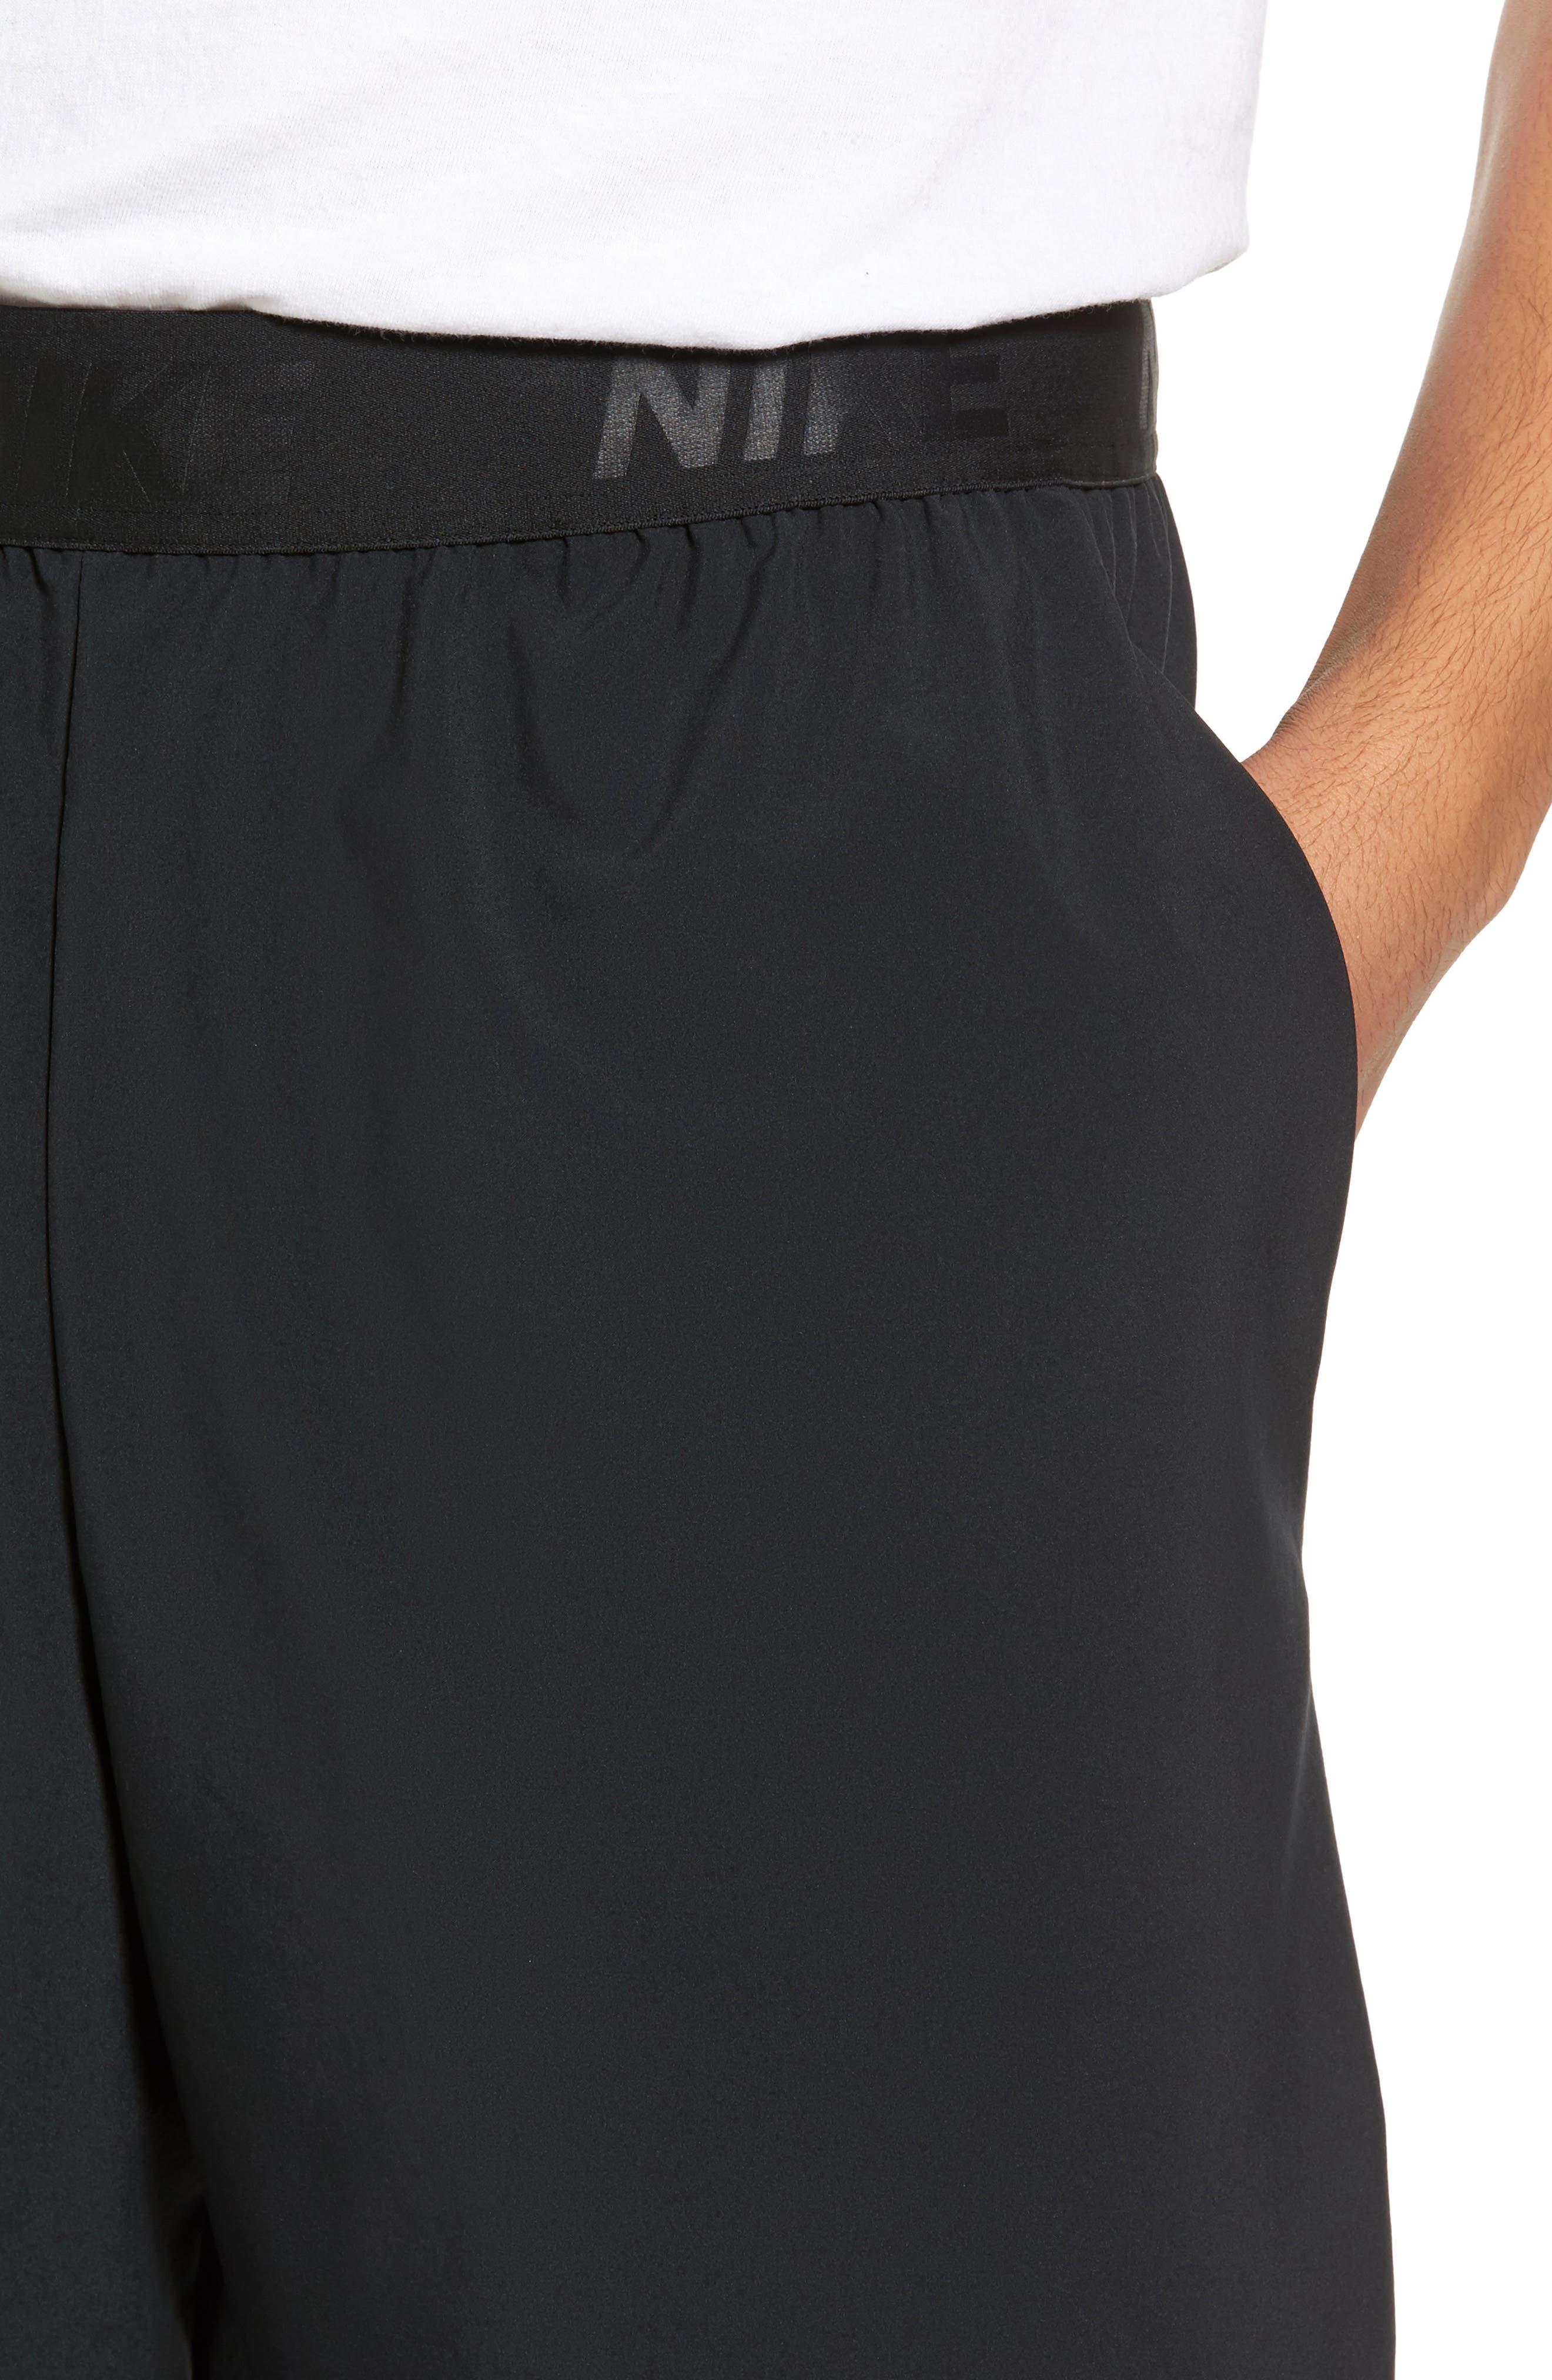 Flex Vent Max Shorts,                             Alternate thumbnail 4, color,                             BLACK/ METALLIC HEMATITE